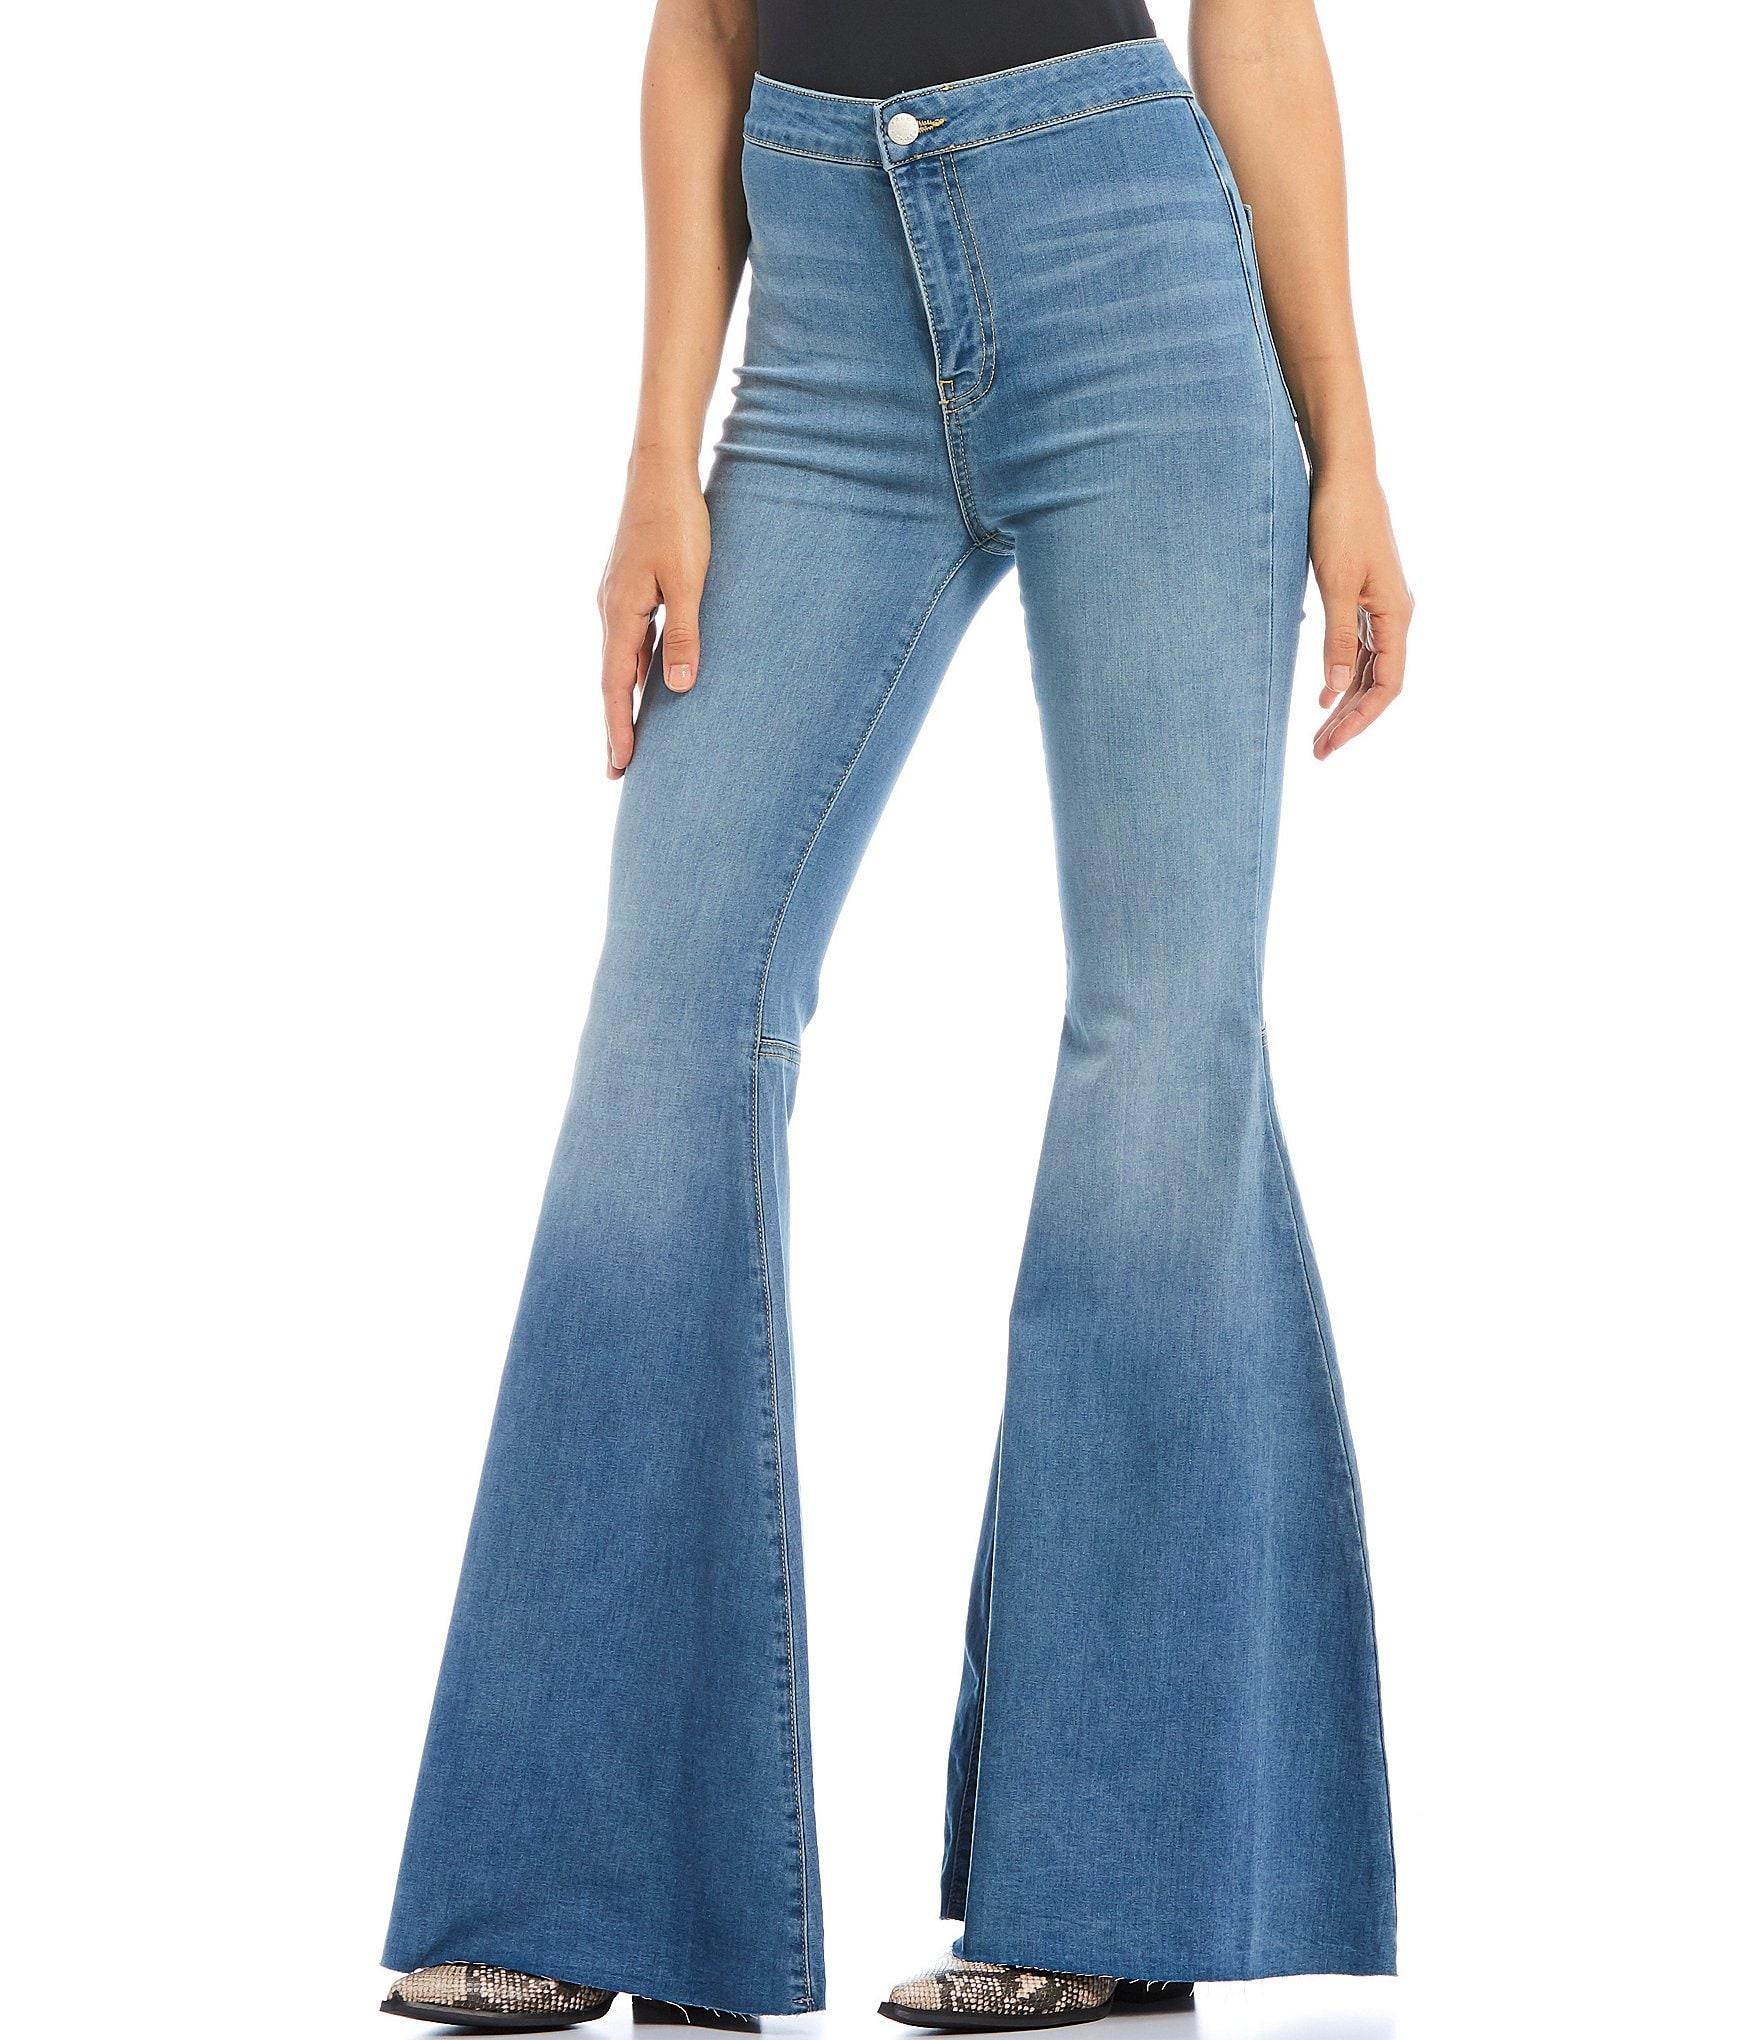 deb02ba70b2 Free People Women s Flared Jeans